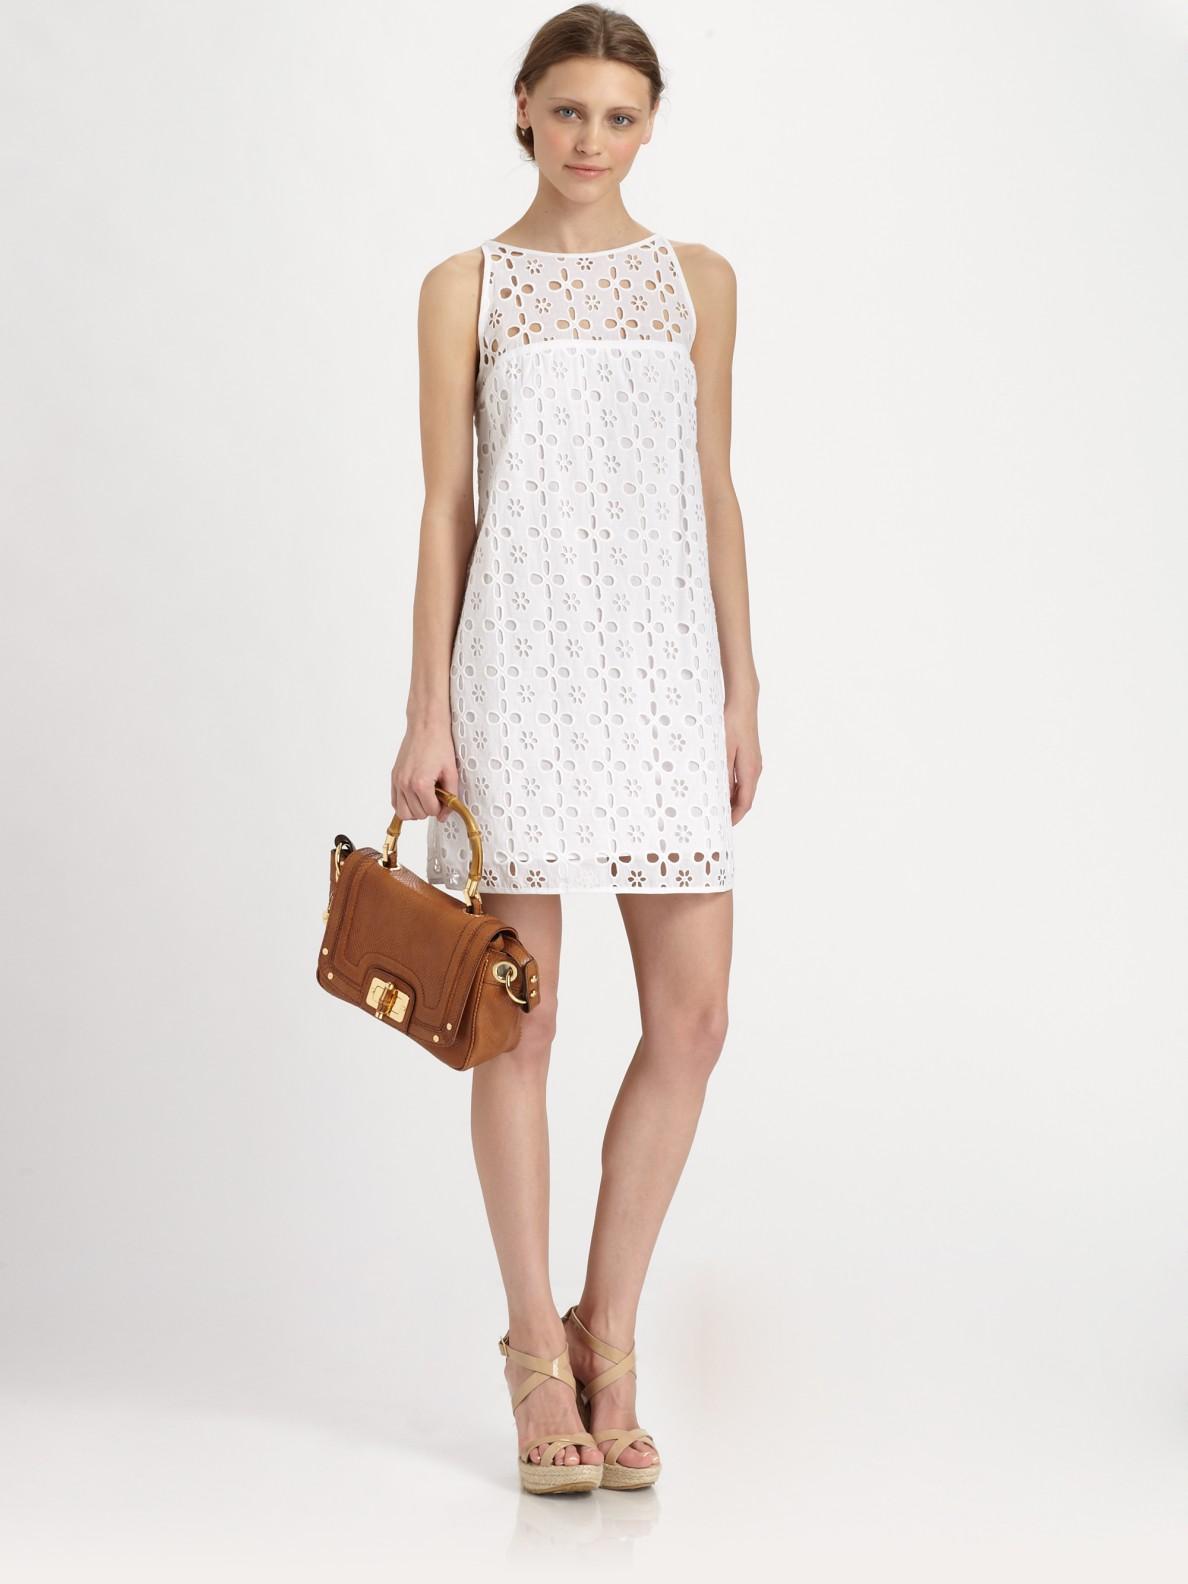 Beautiful White Eyelet Dress Womens  Best Dress Image